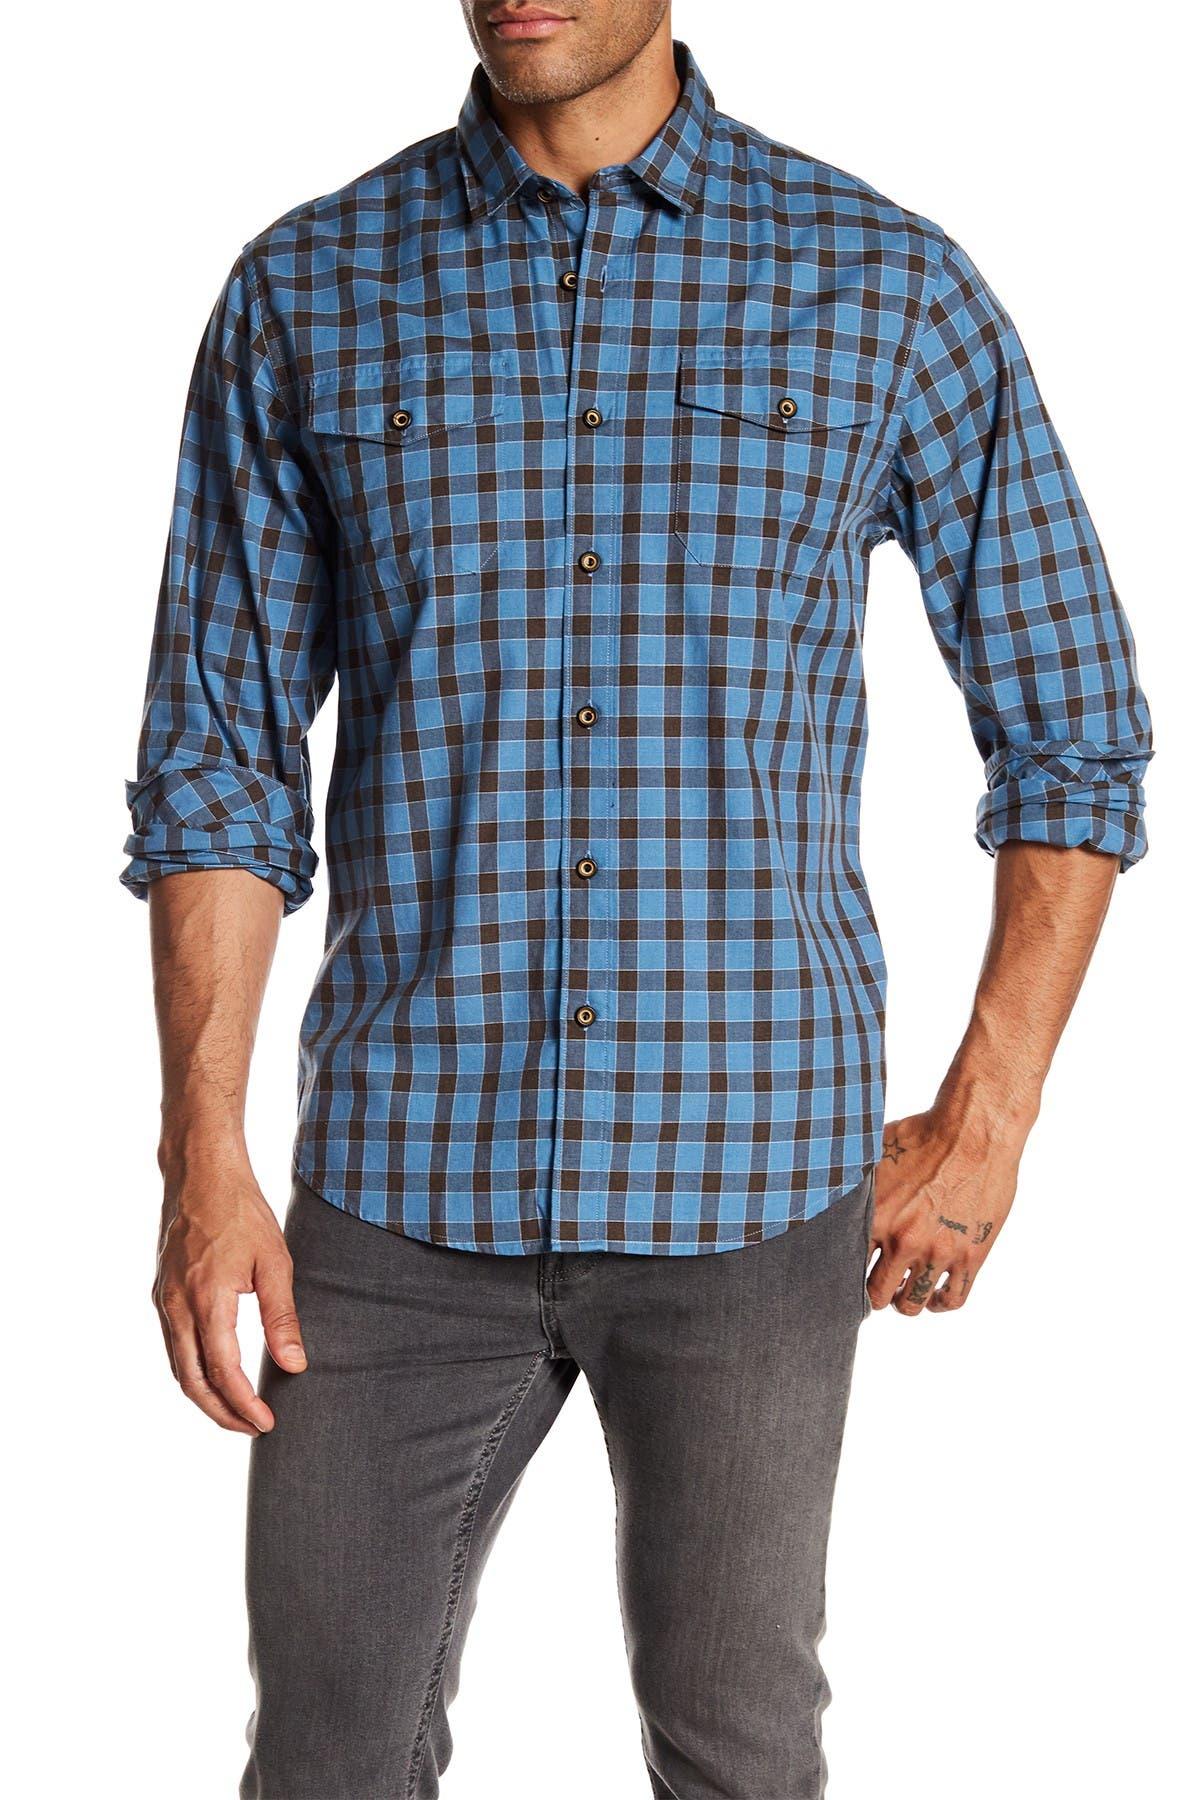 Image of COASTAORO Lake Plaid Regular Fit Flannel Shirt